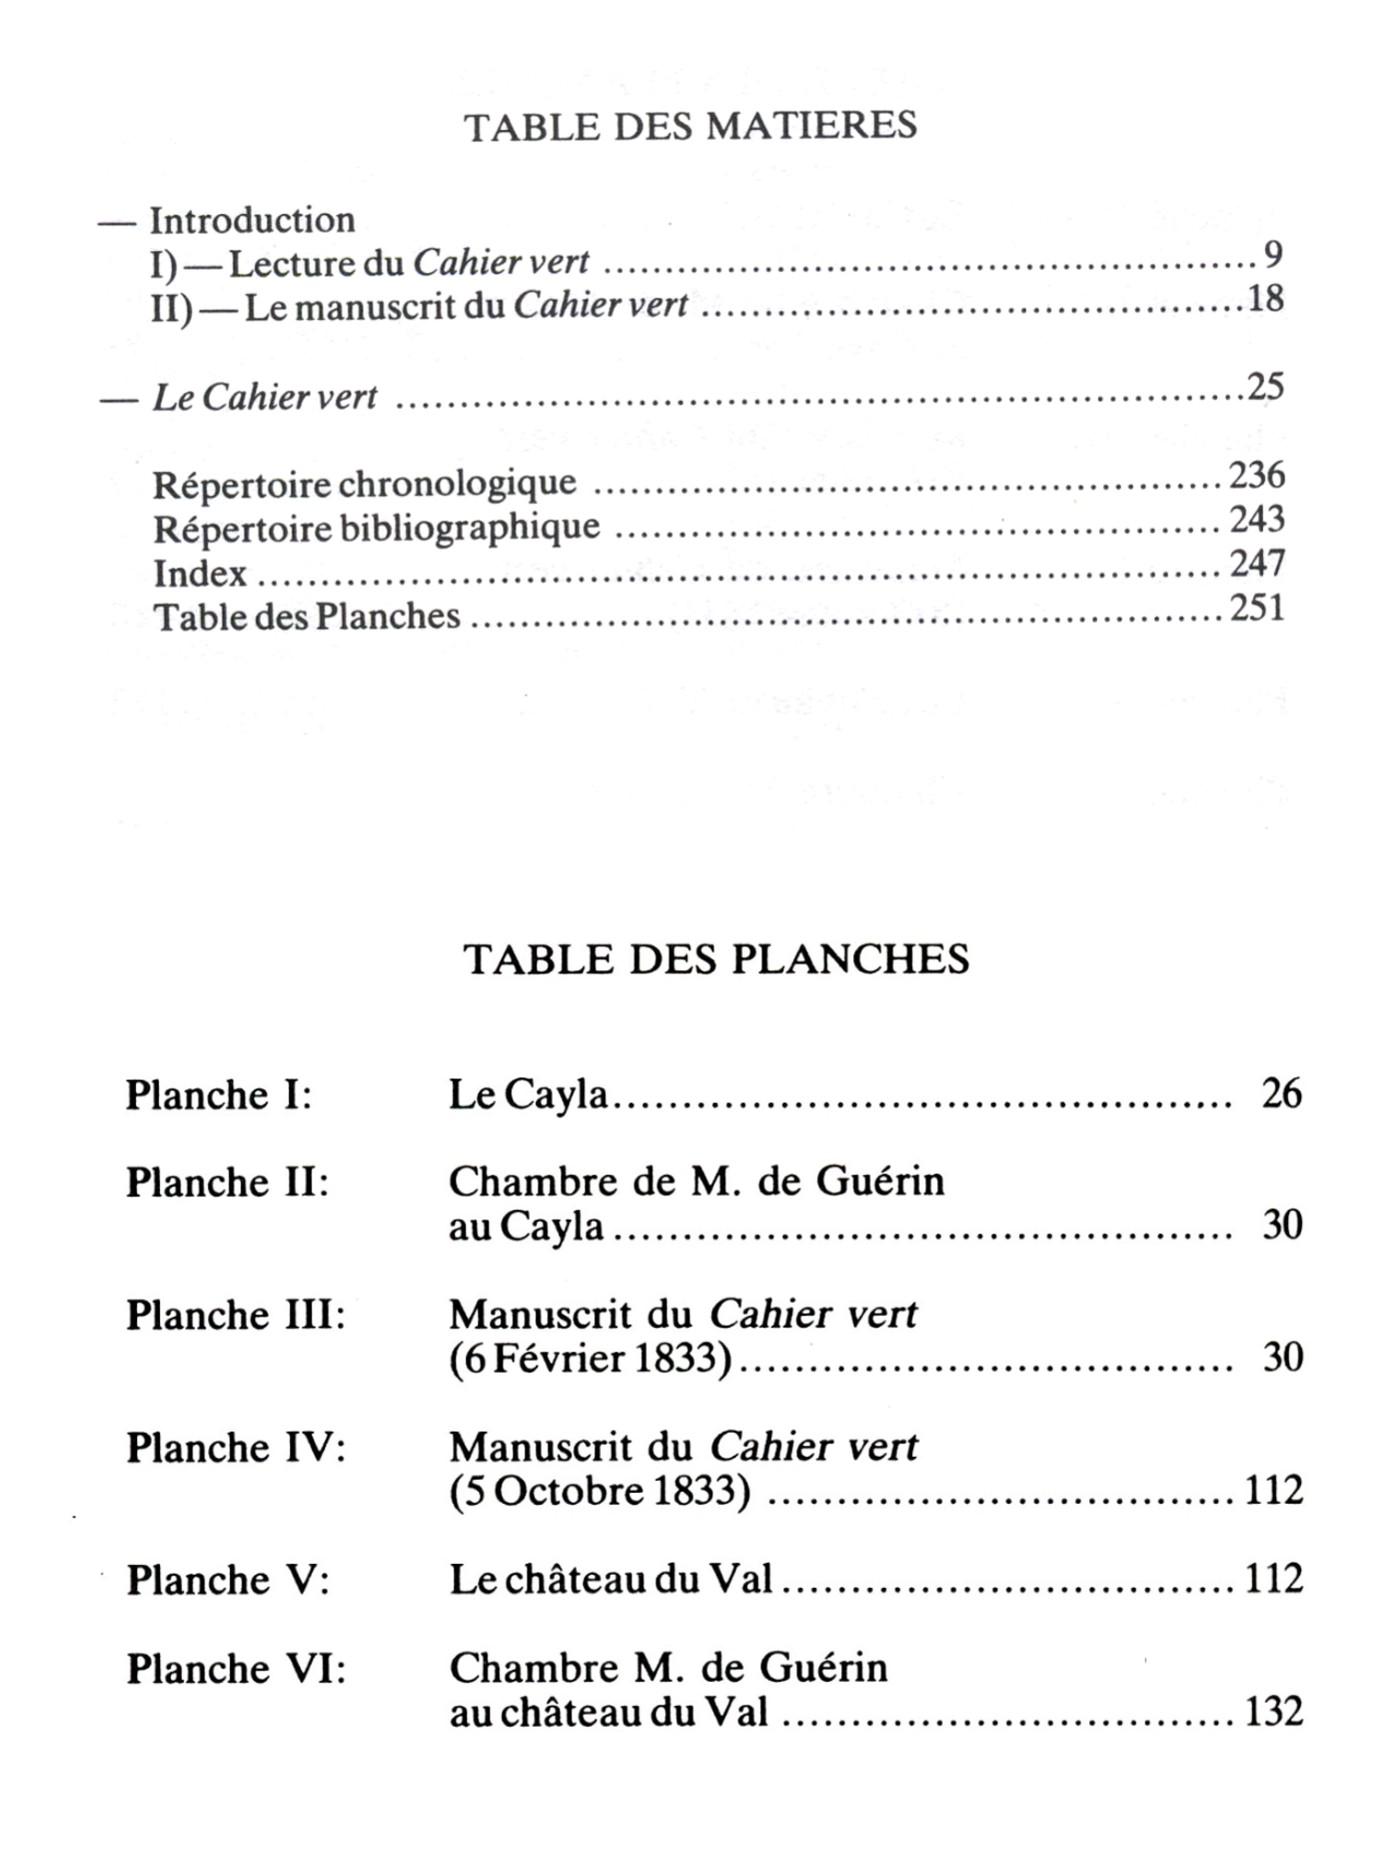 Cahier vert_Tables